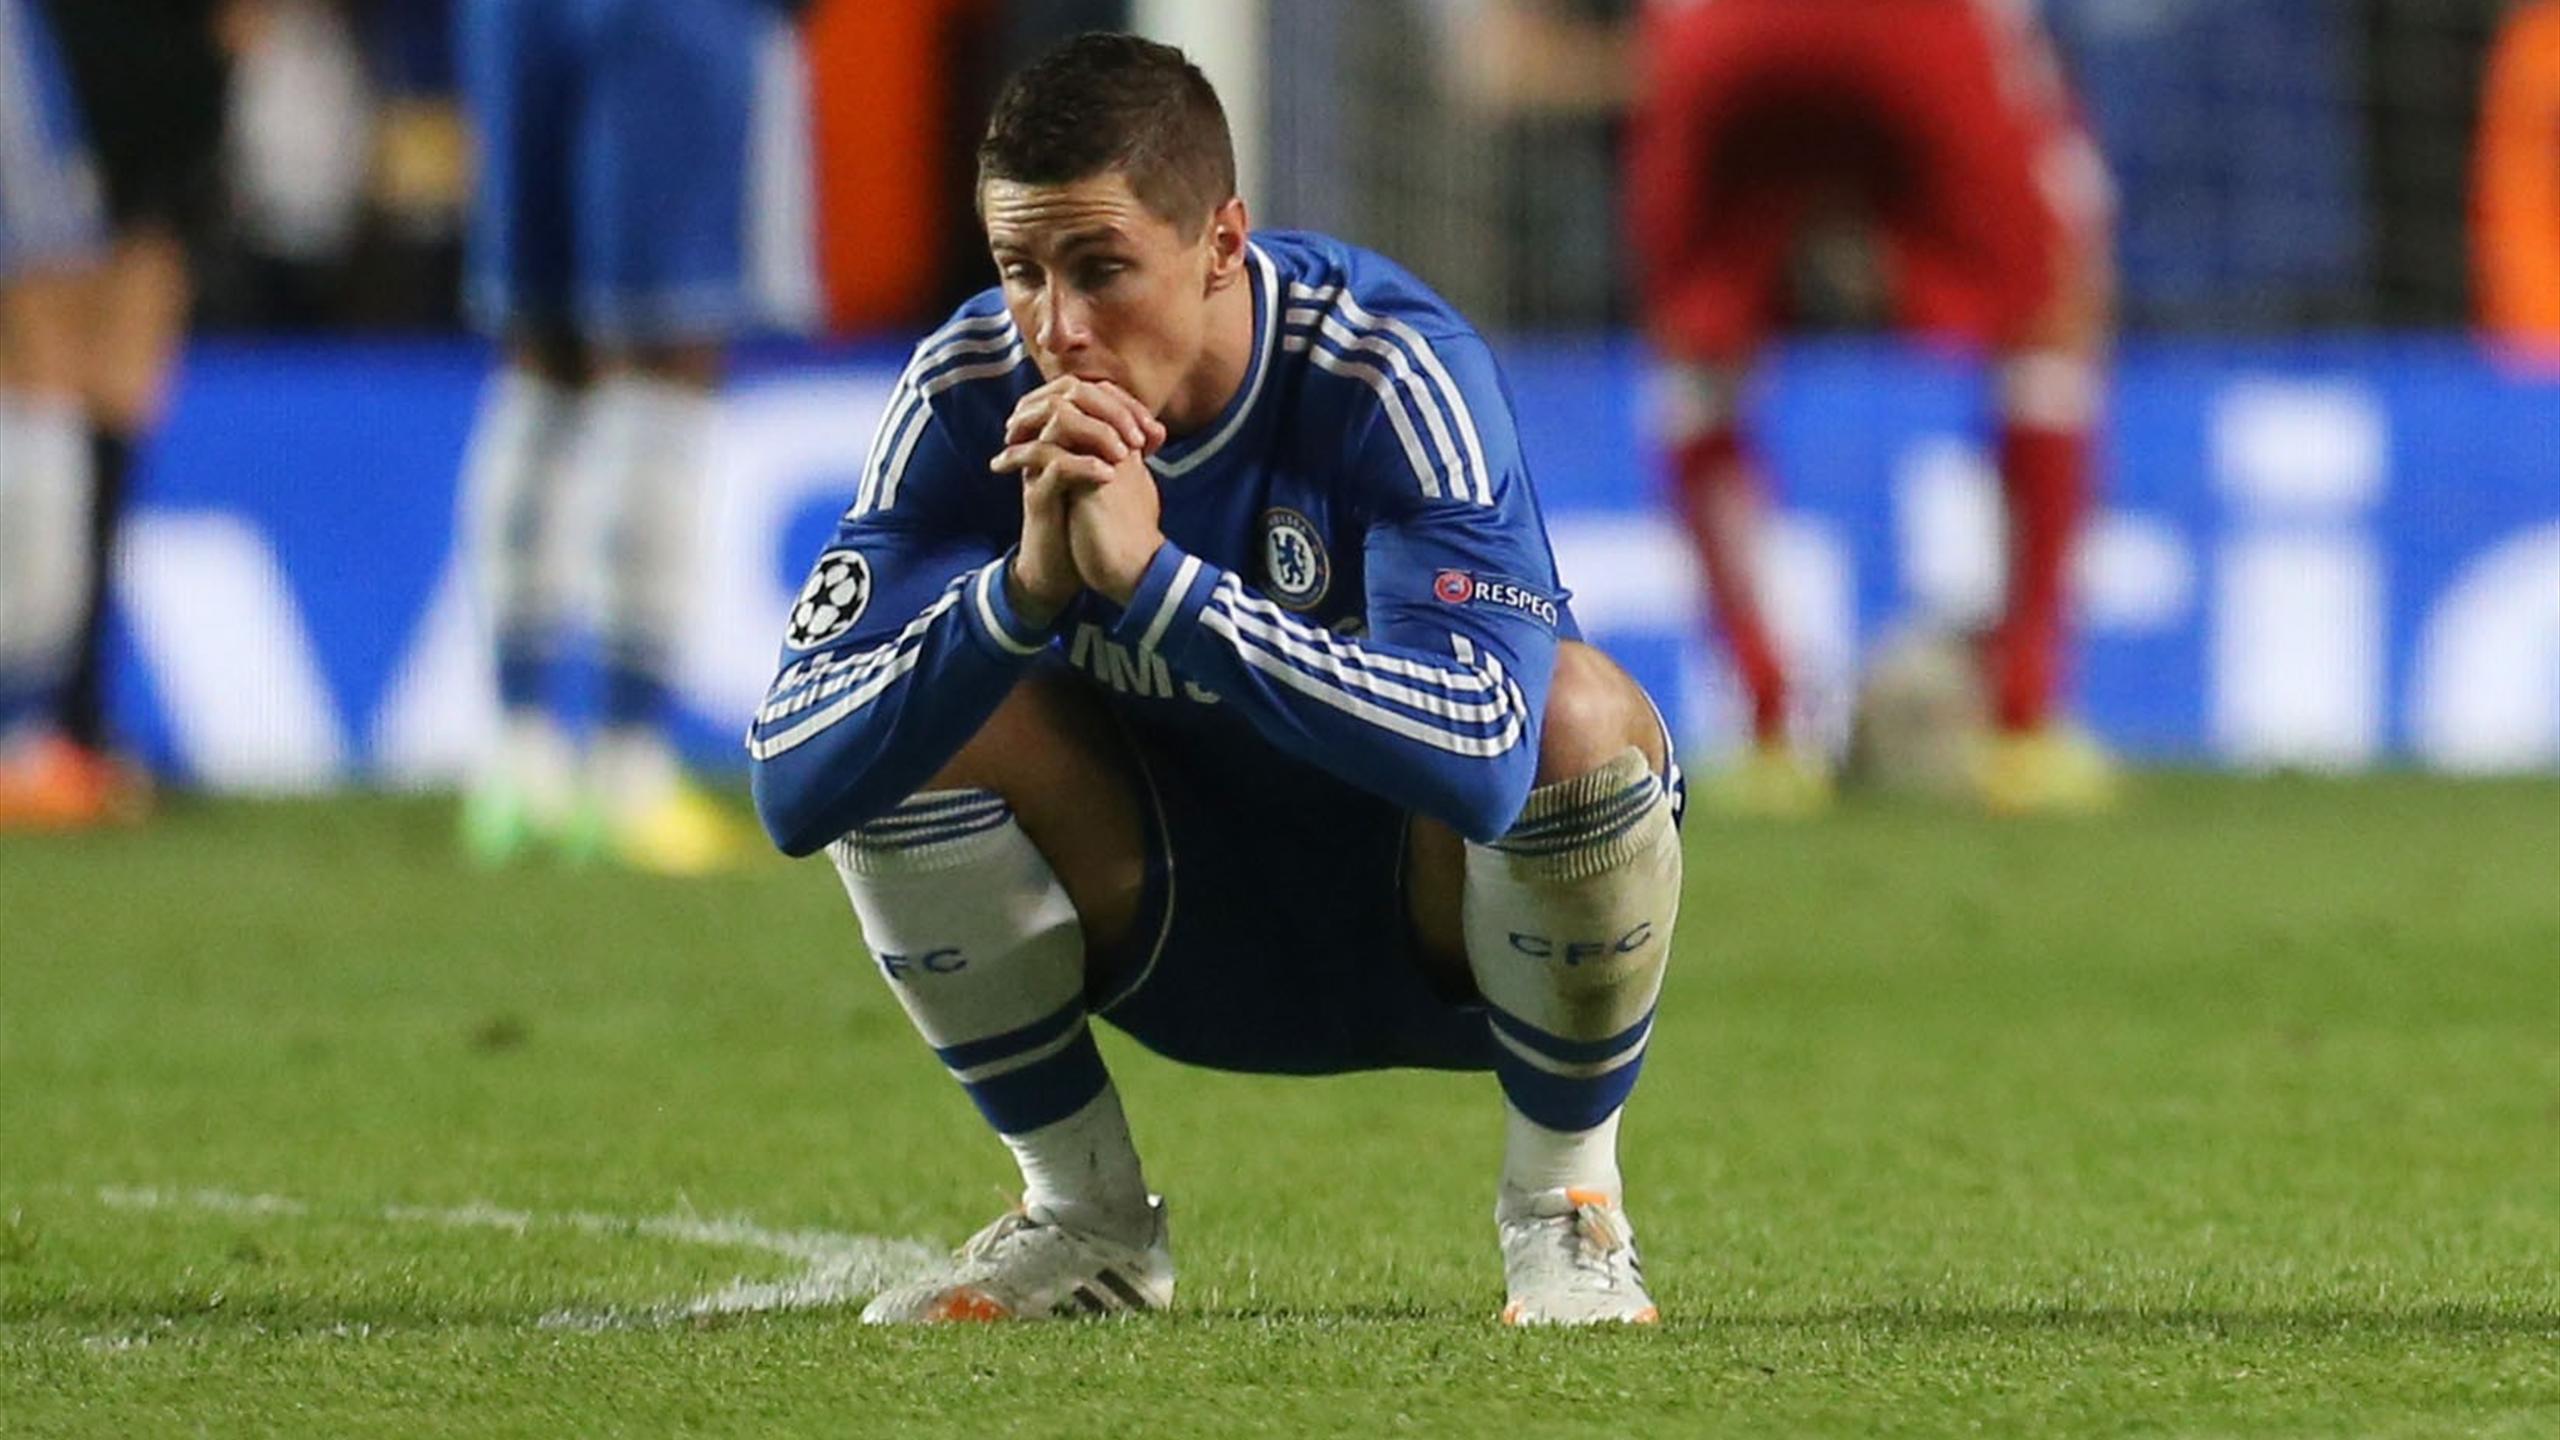 Fernando Torres (Chelsea) face à l'Atlético Madrid 2014